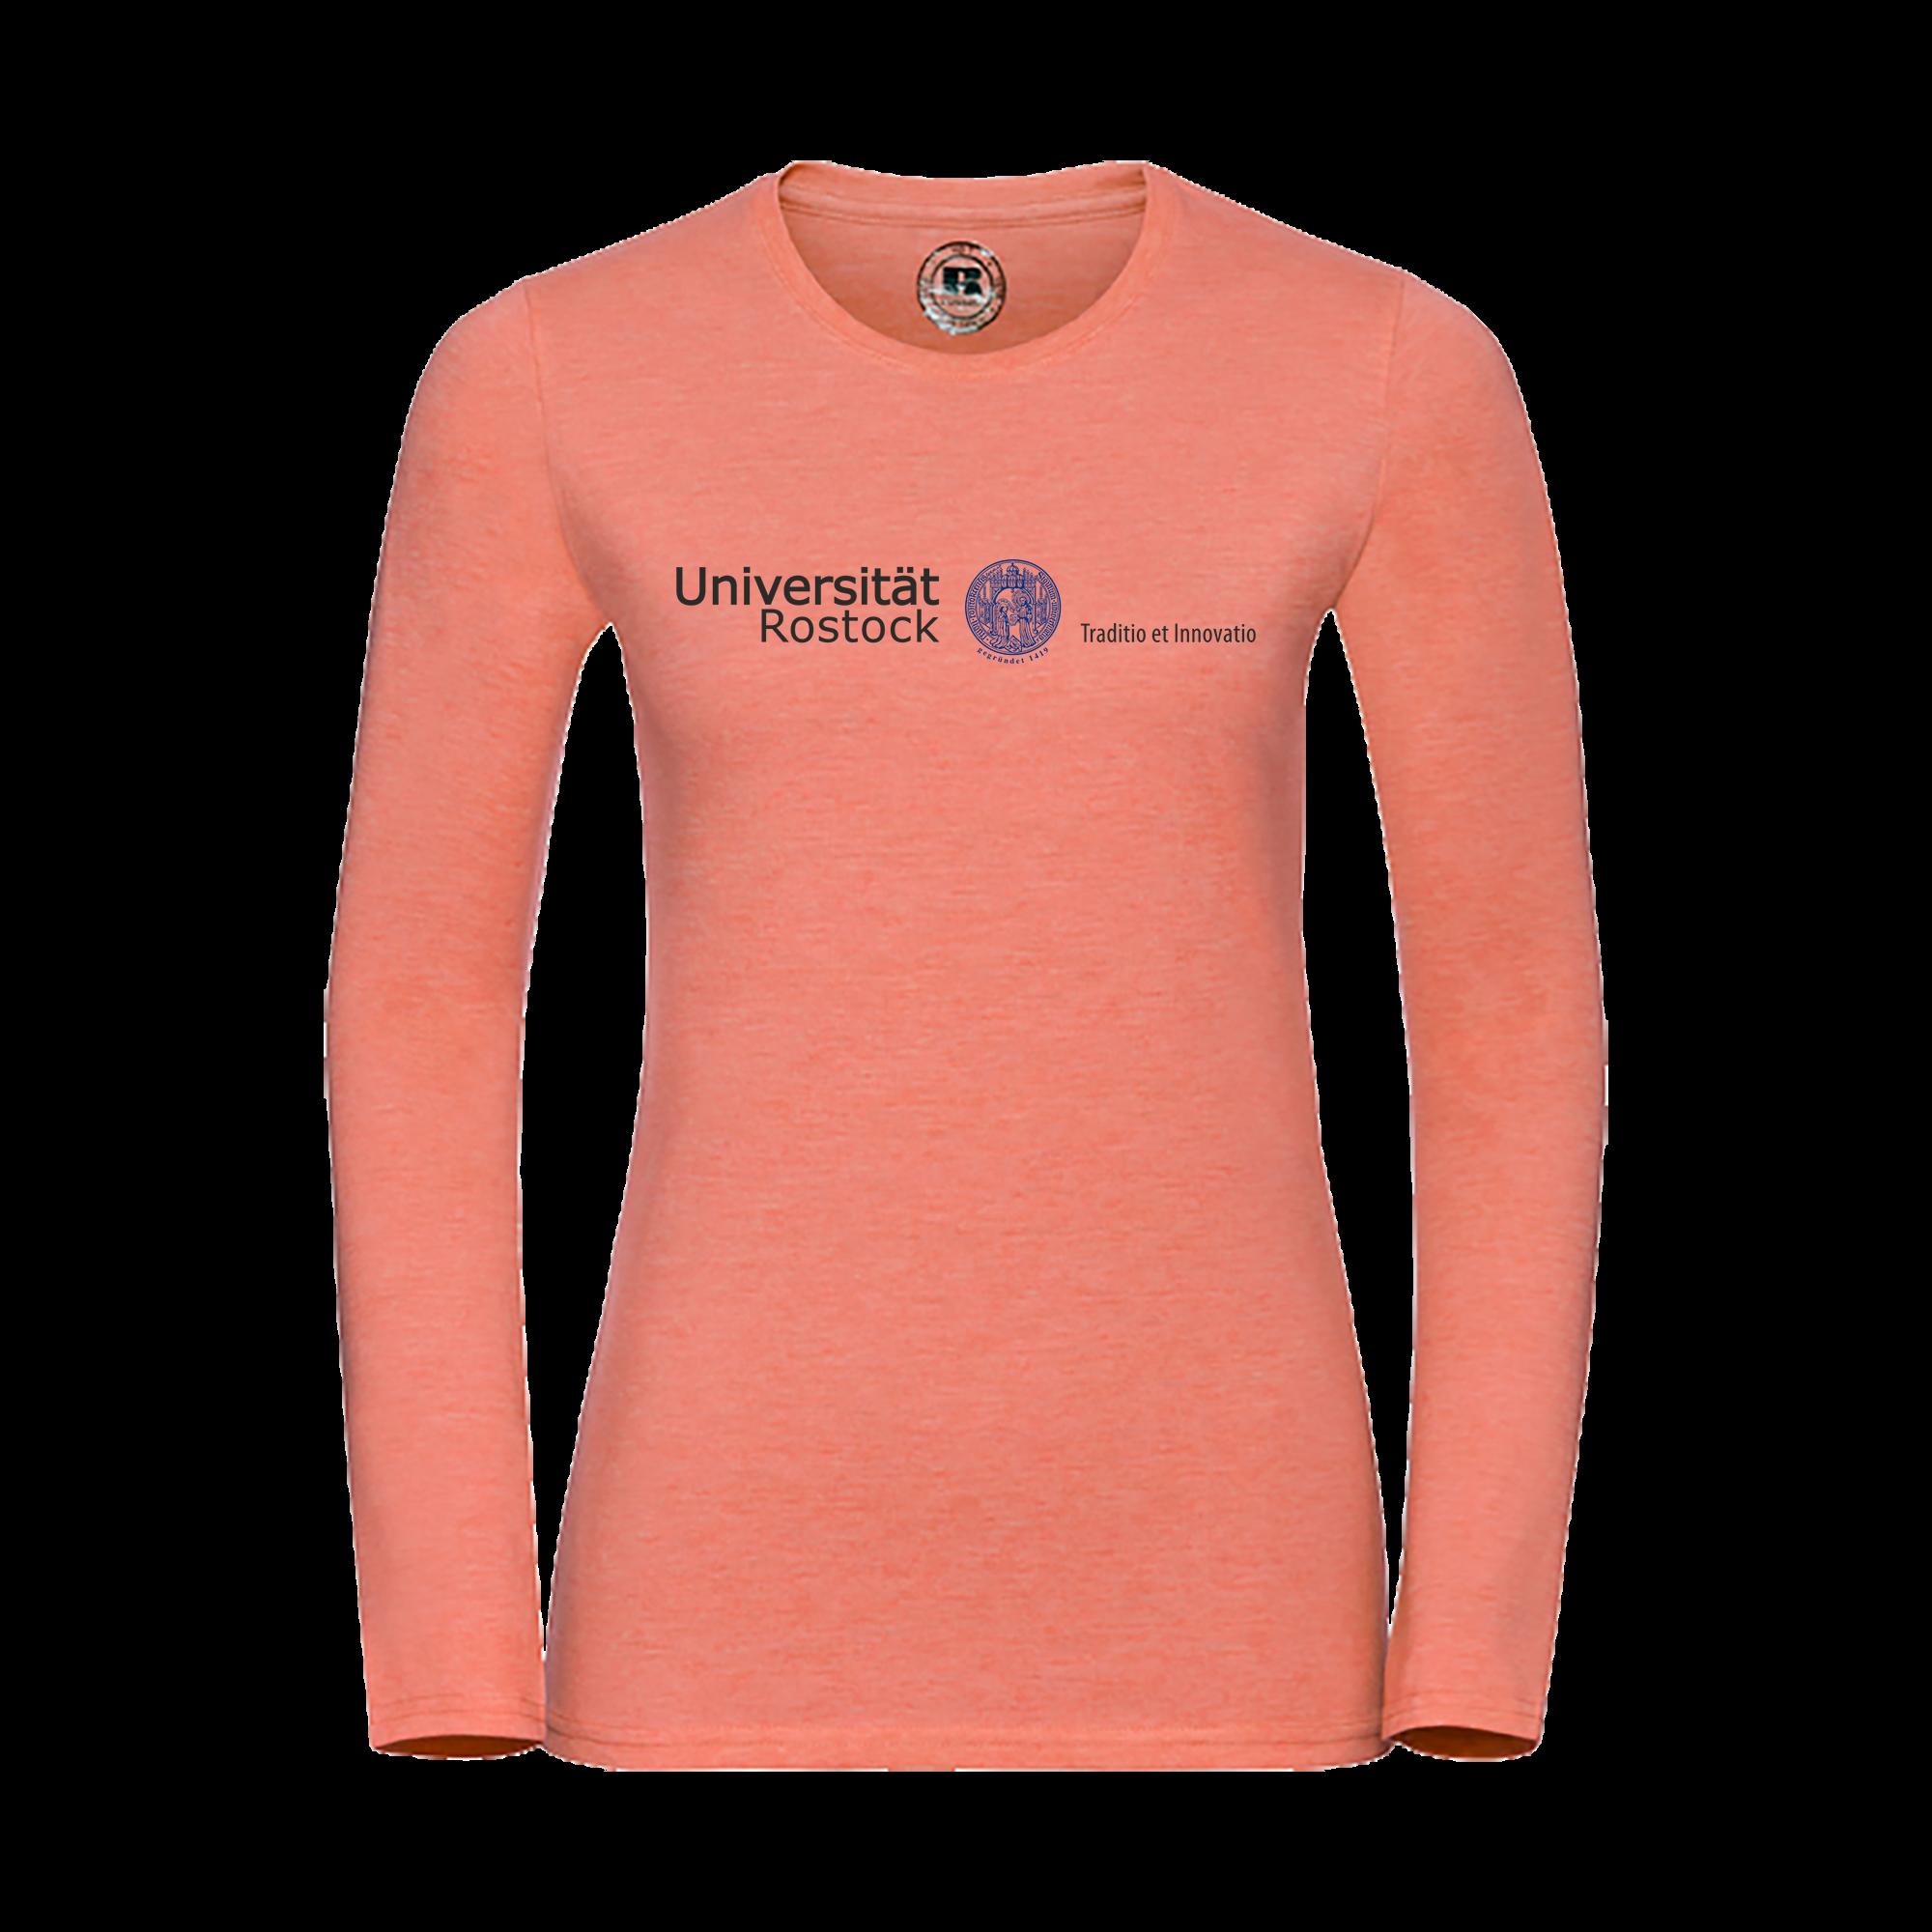 da6de5b03bd6b9 Damen Langarm-Shirt mit original Schriftzug der Universität Rostock und blauem  Siegel